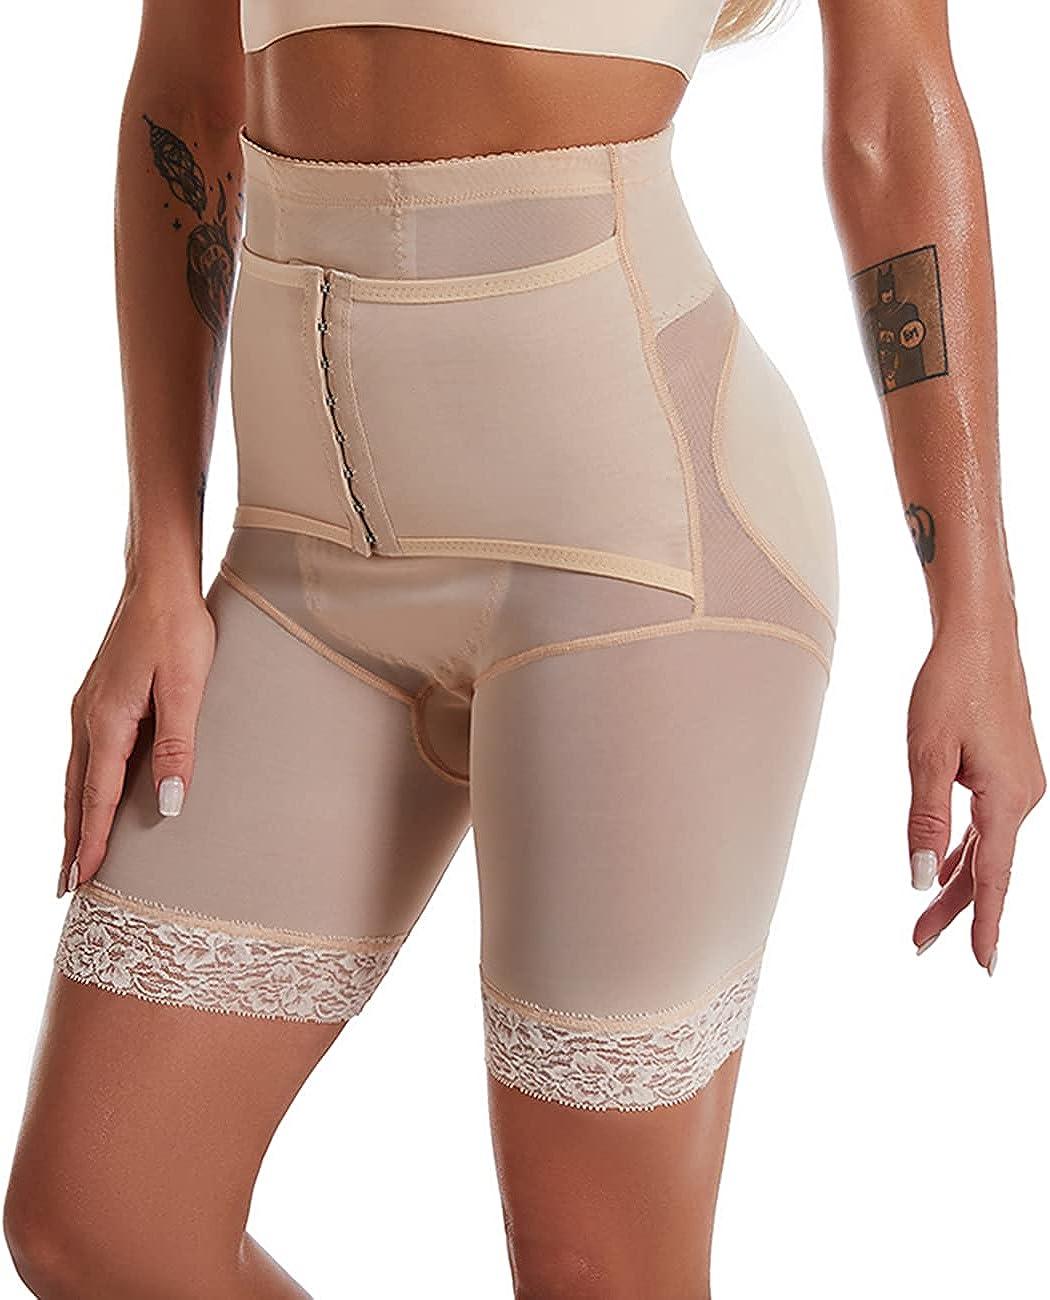 Double Tummy Control Shapewear for Women High Waist Butt Lifter Boyshorts Adjustable Body Shaper Thigh Slimmer Pants